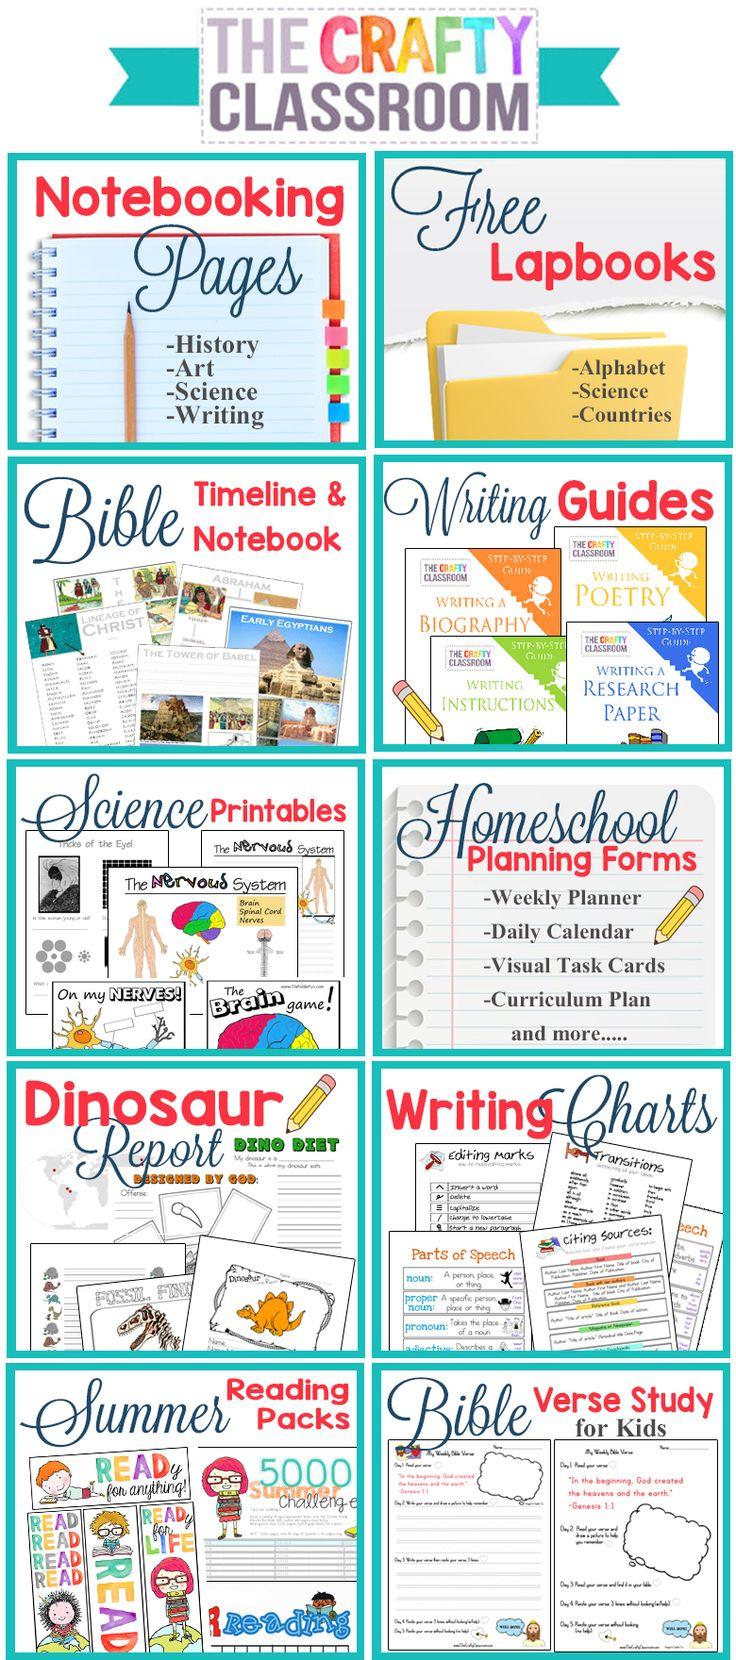 805 best Homeschool Use images on Pinterest | Homeschool ...